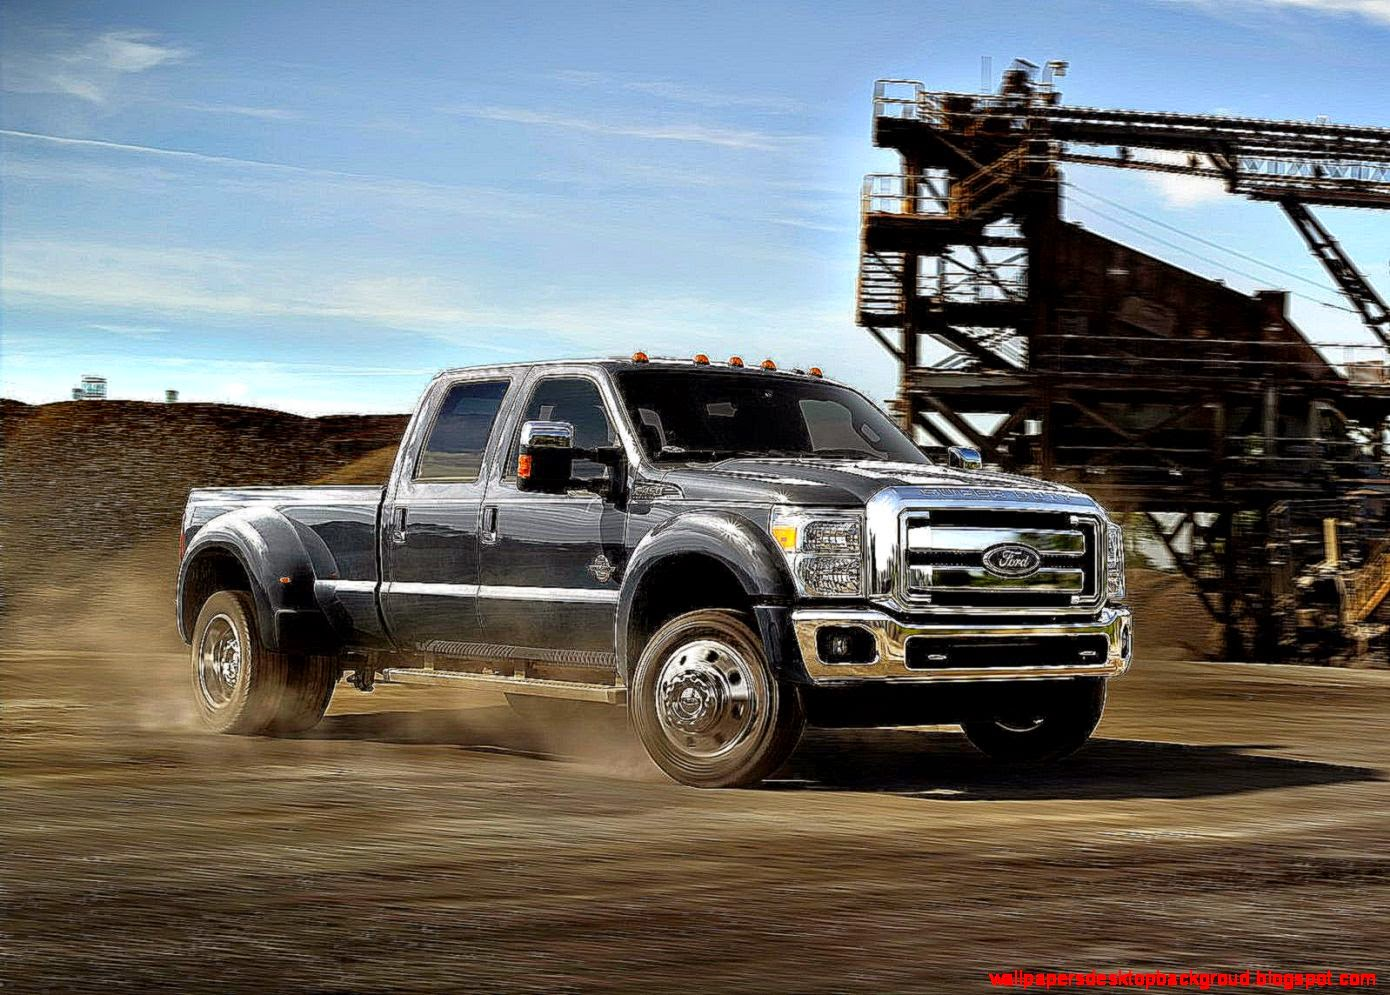 New Ford Truck 4x4 Wallpaper HD 3D Desktop Wallpapers 1390x995